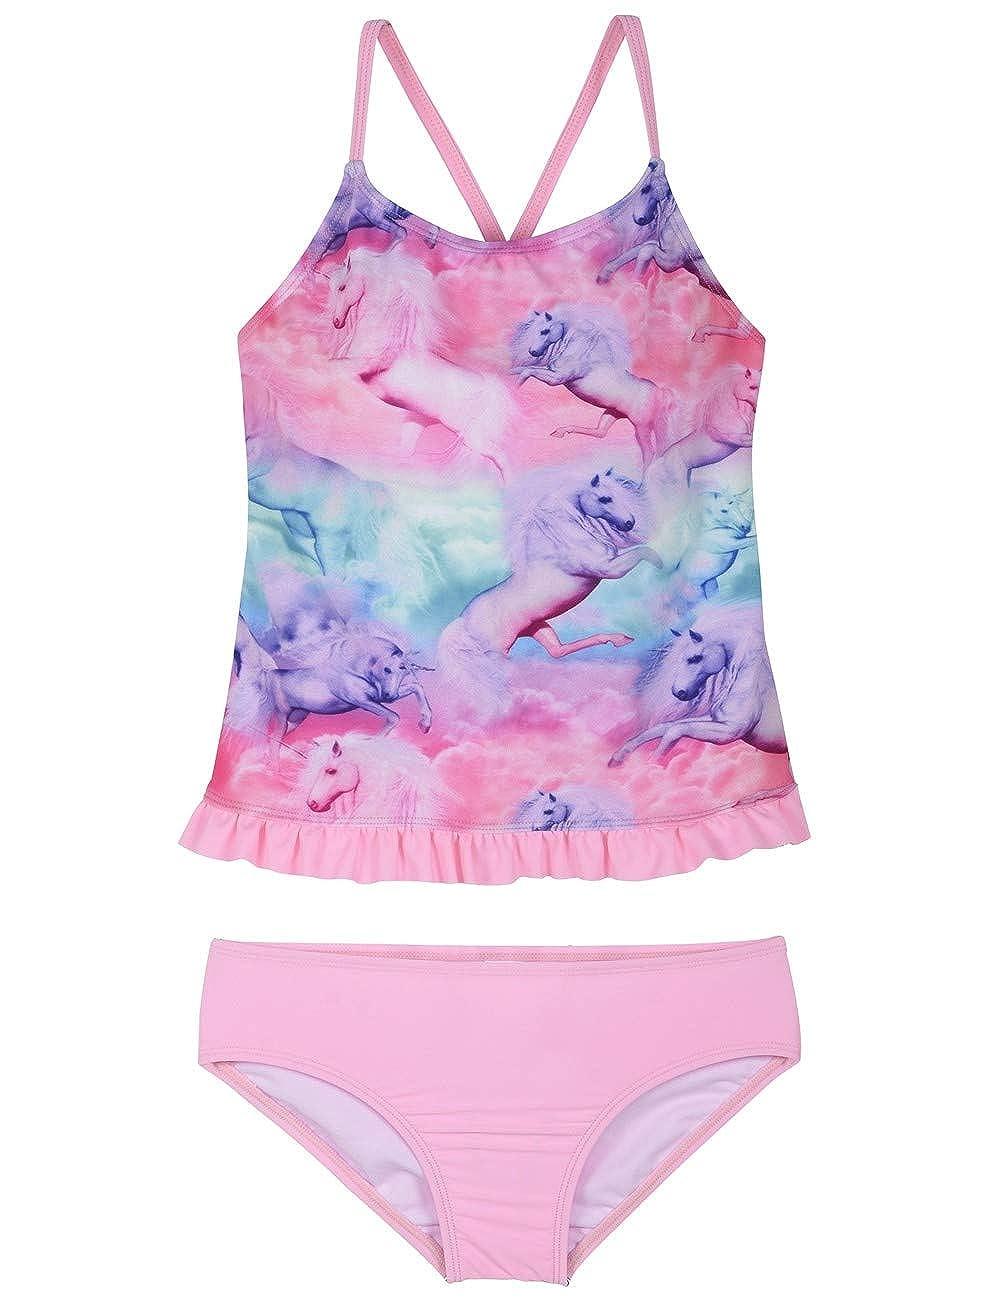 Firpearl Girls Two Piece Swimsuit Rainbow Unicorn Print Flounce Tankini Kids Swimwear